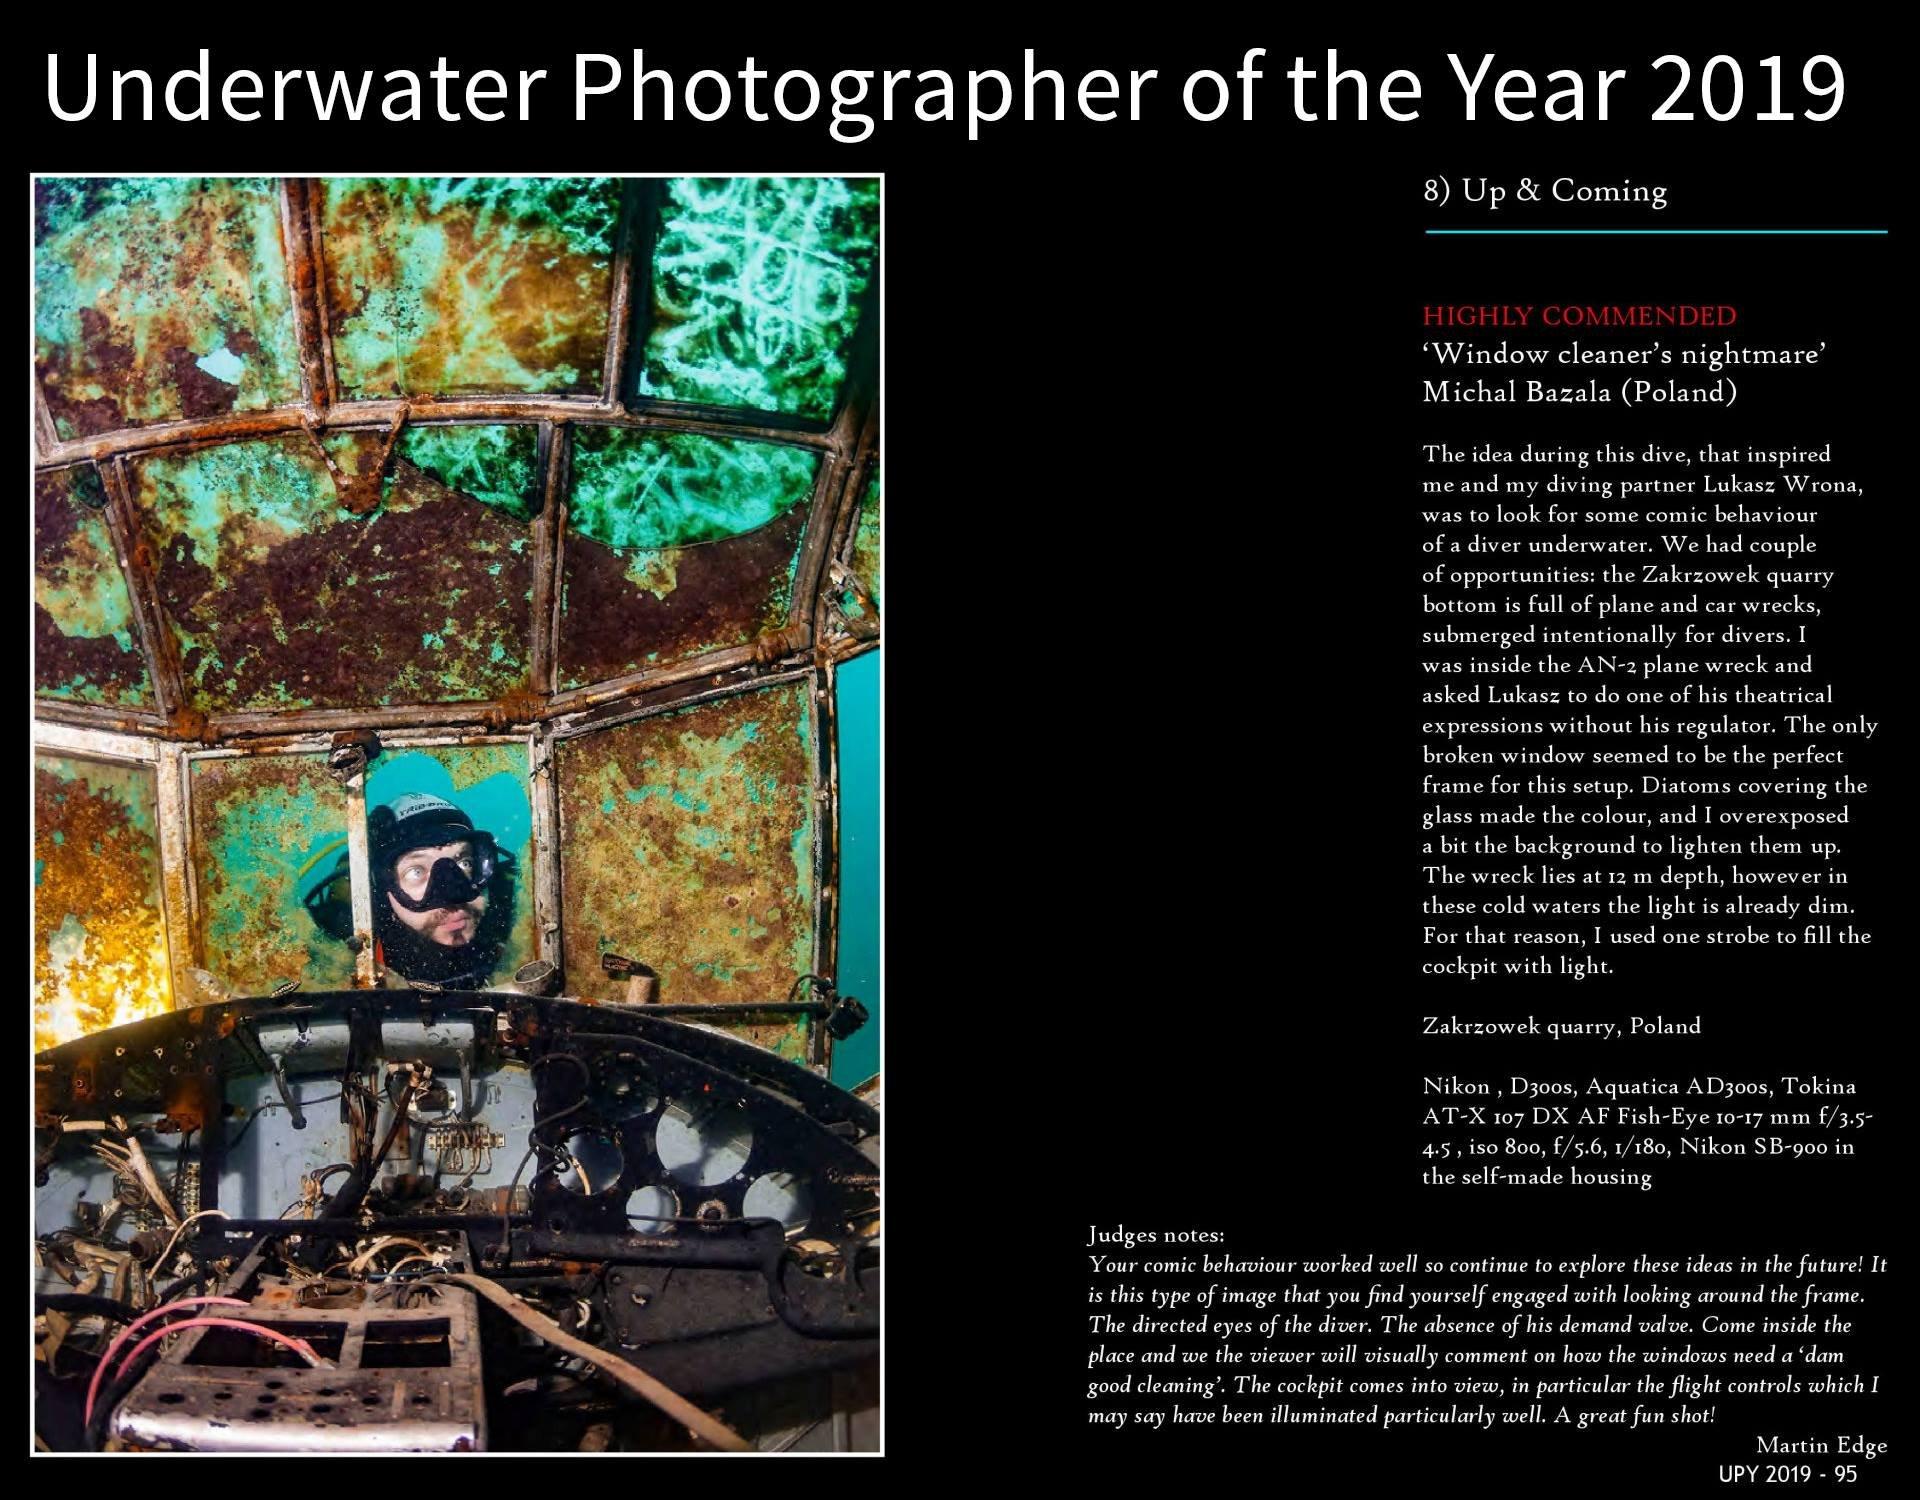 Jestem w Underwater Photographer Of The Year 2019!